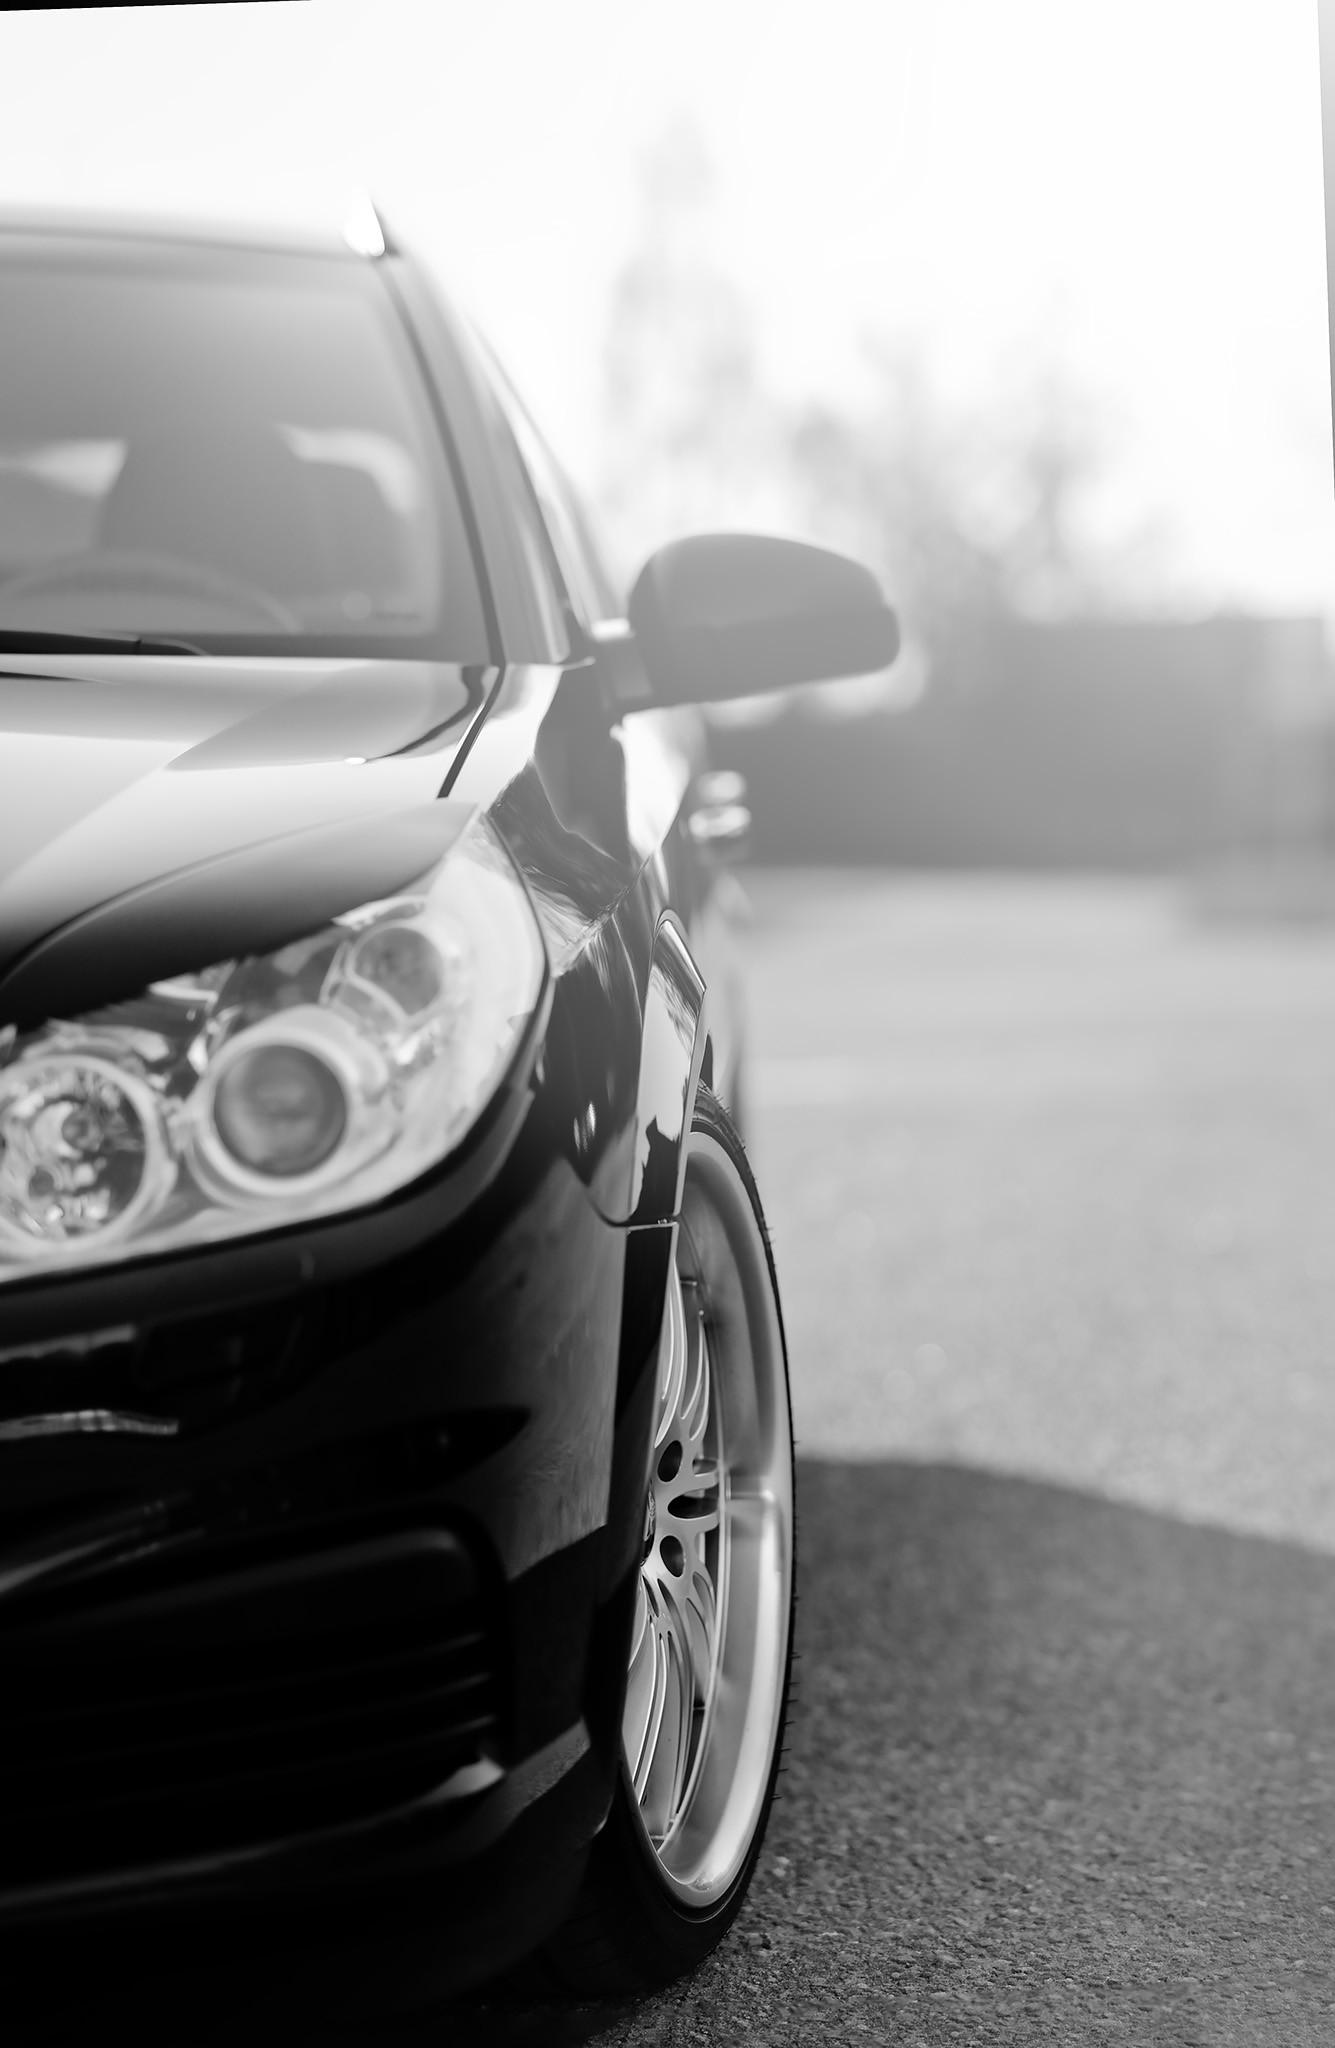 Opel Vectra Car bokeh